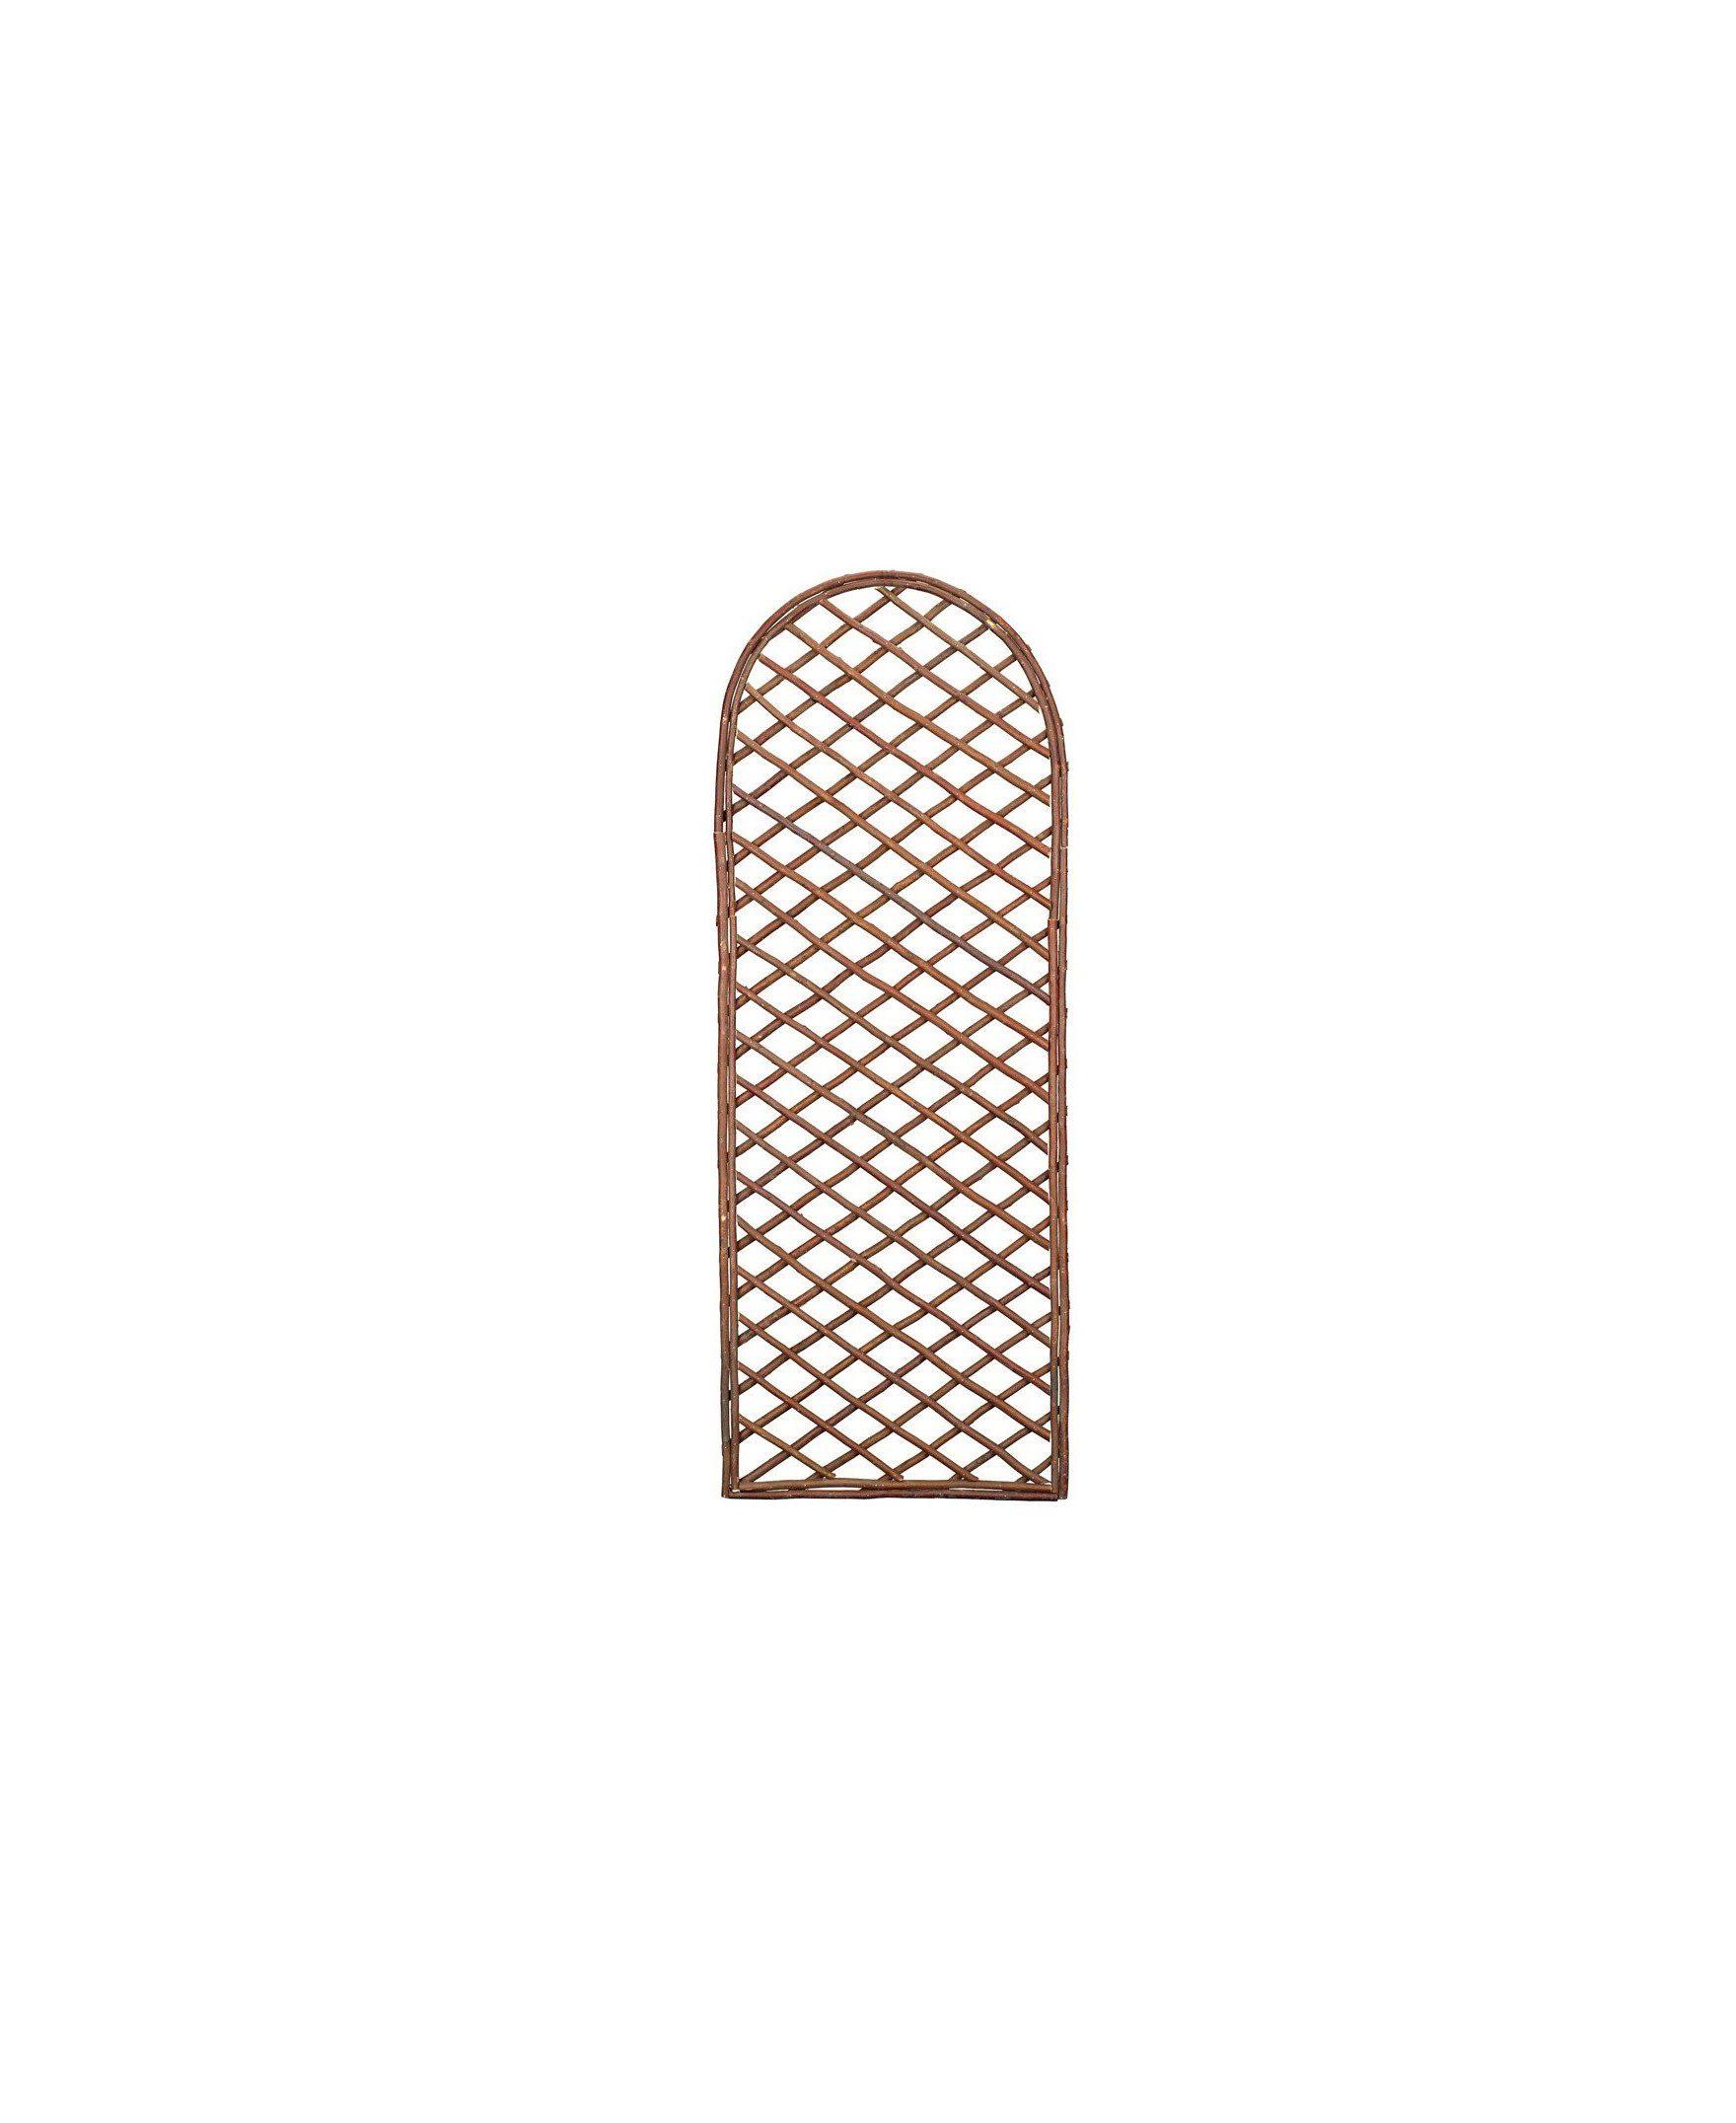 Gardman 1.8m x 0.6m Framed Willow Trellis Panel - Curved Top